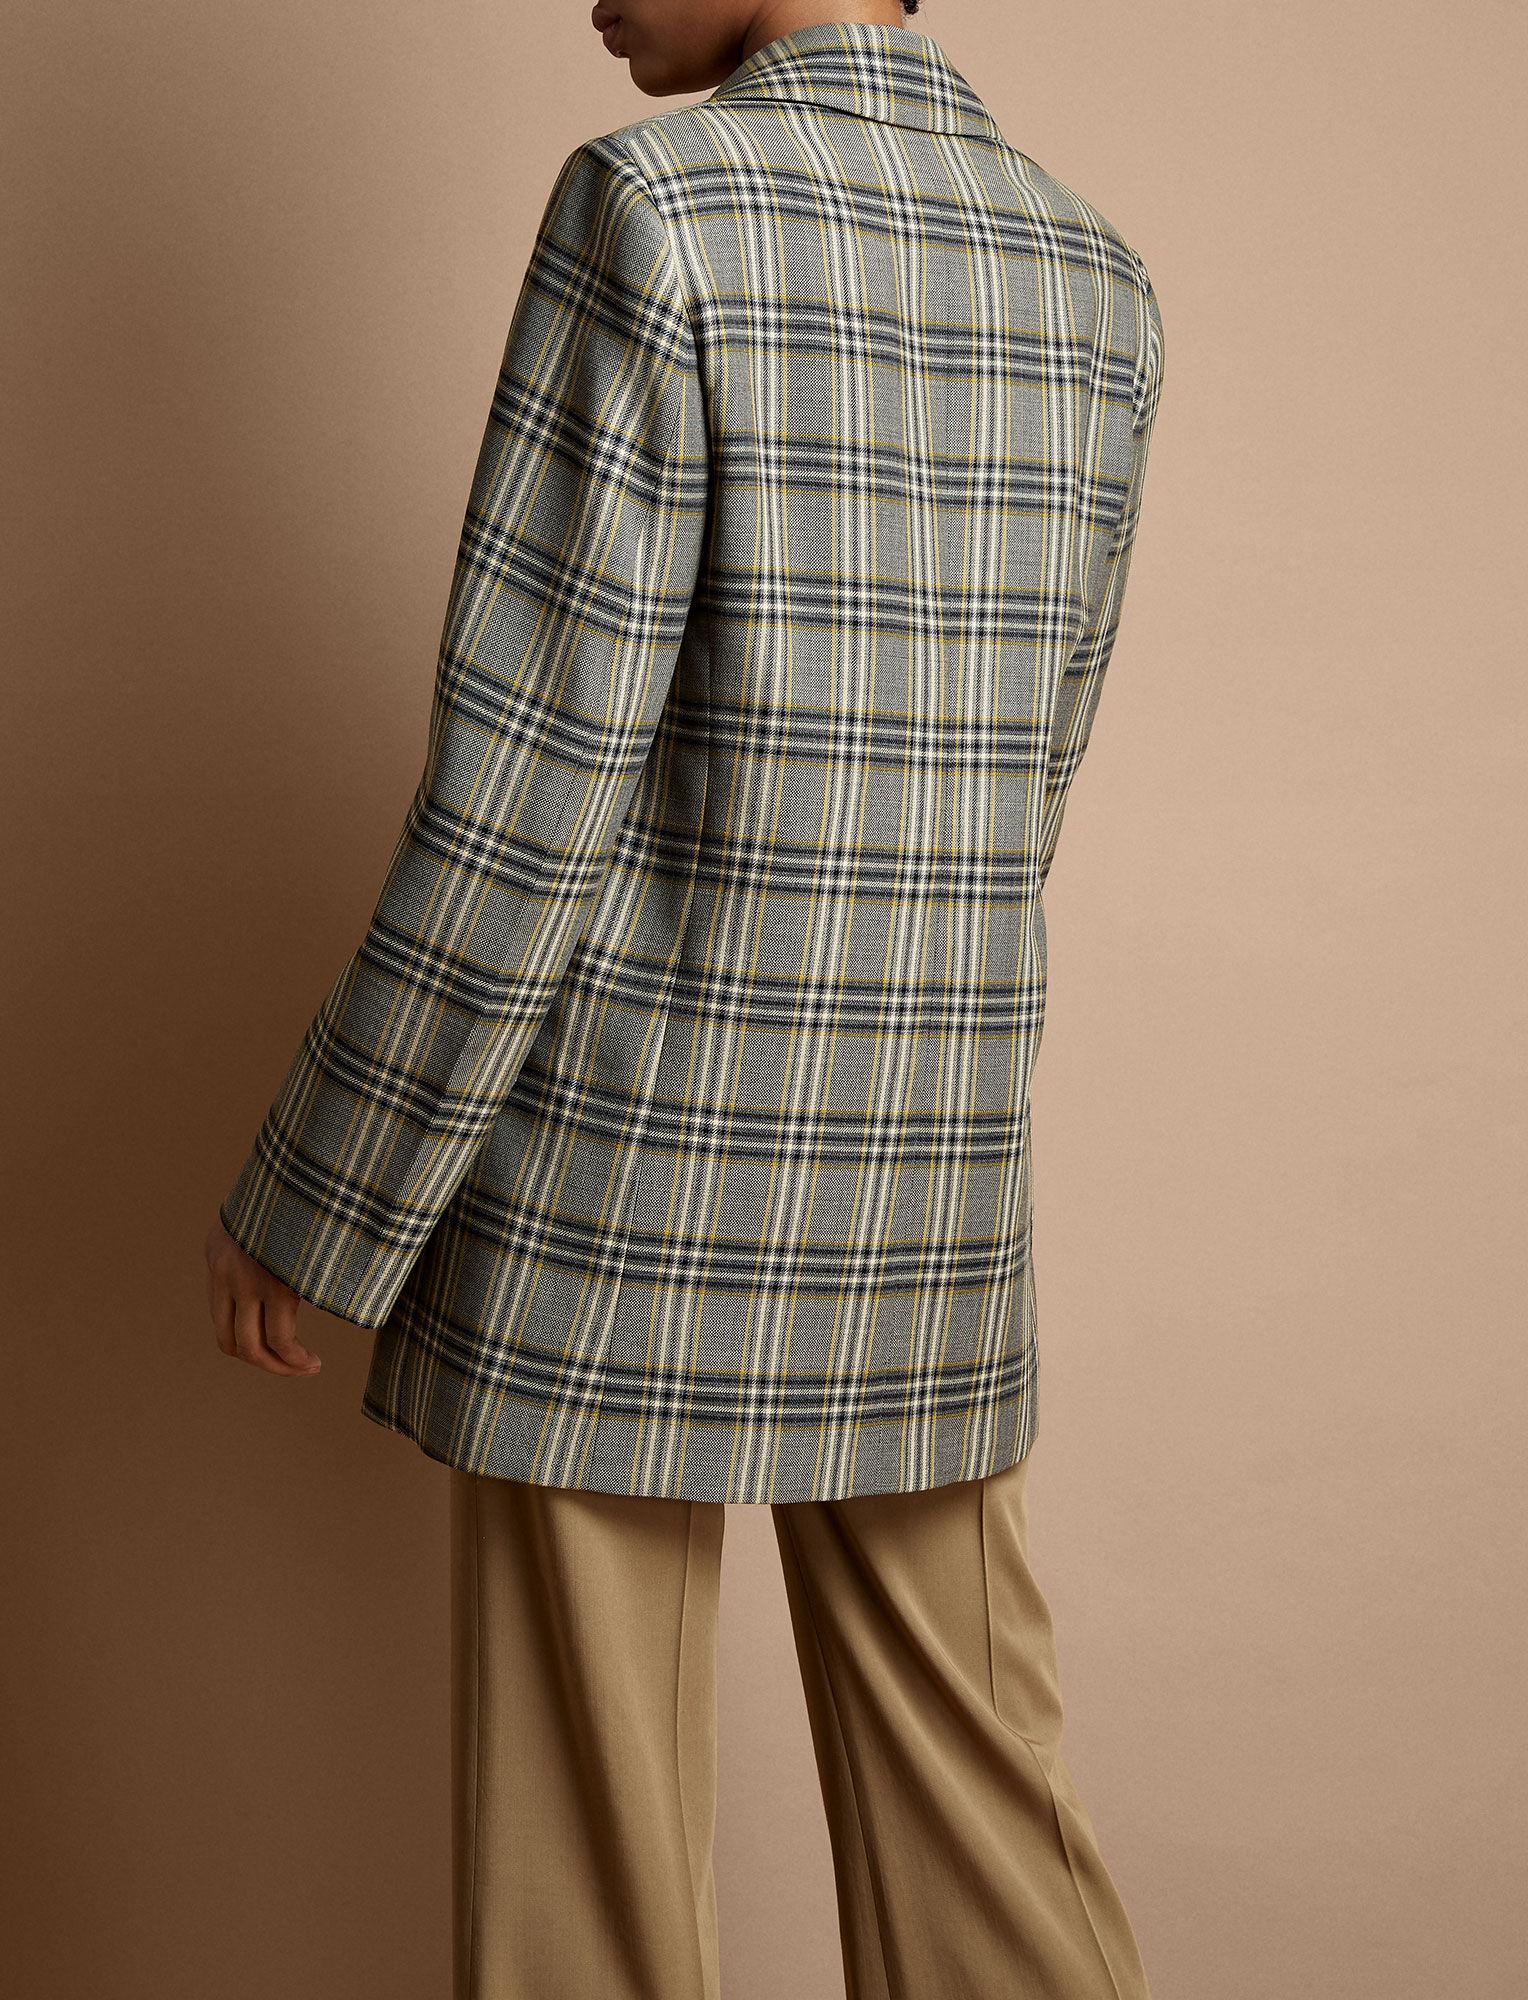 Joseph, Gemina Tropical Check Jacket, in MULTICOLOUR